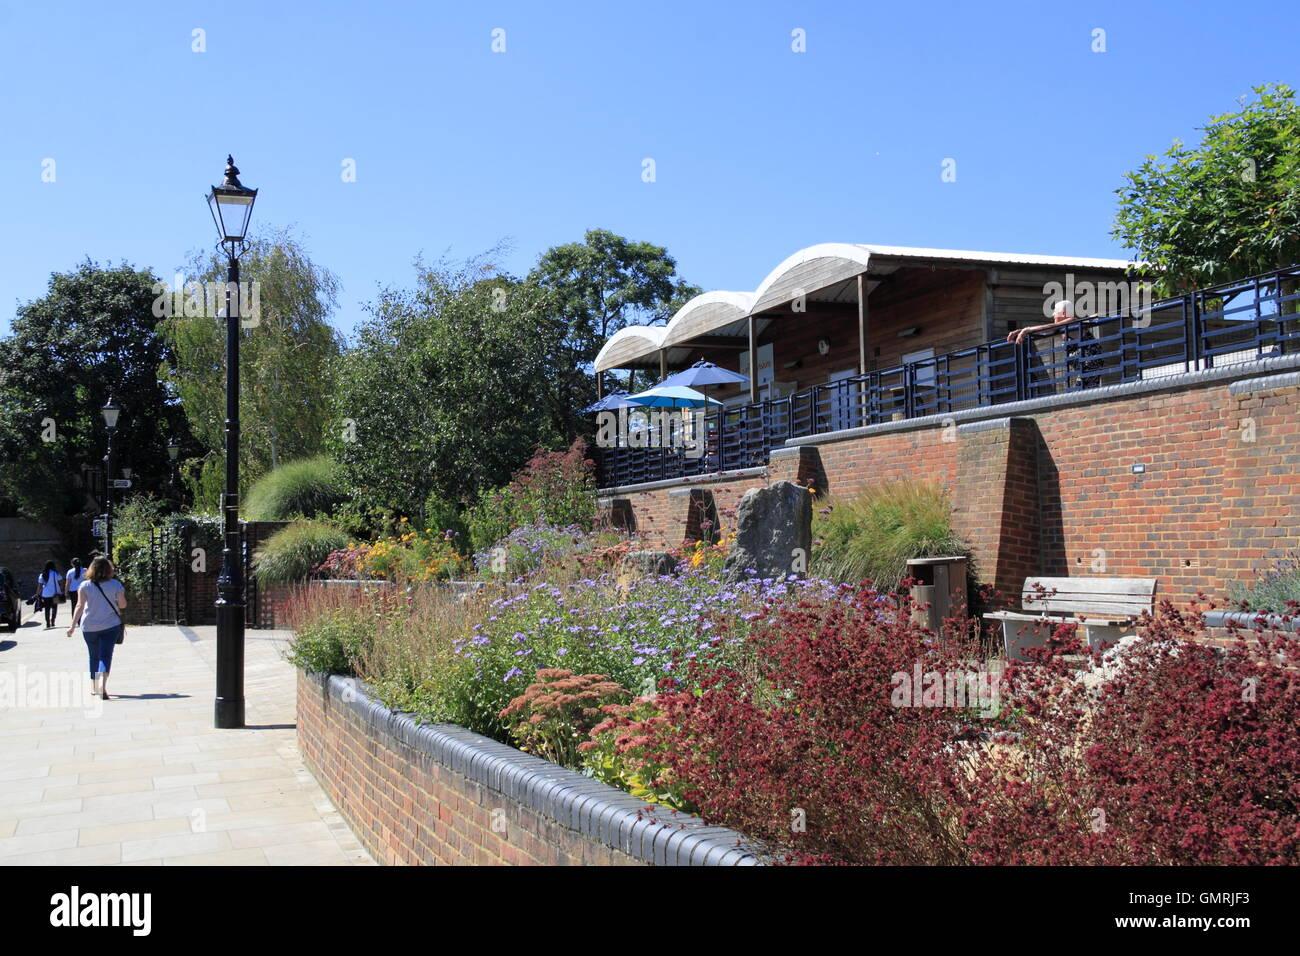 Cafe Sunshine, Diamond Jubilee Gardens, Embankment, Twickenham, Greater London, England, Great Britain, United Kingdom - Stock Image